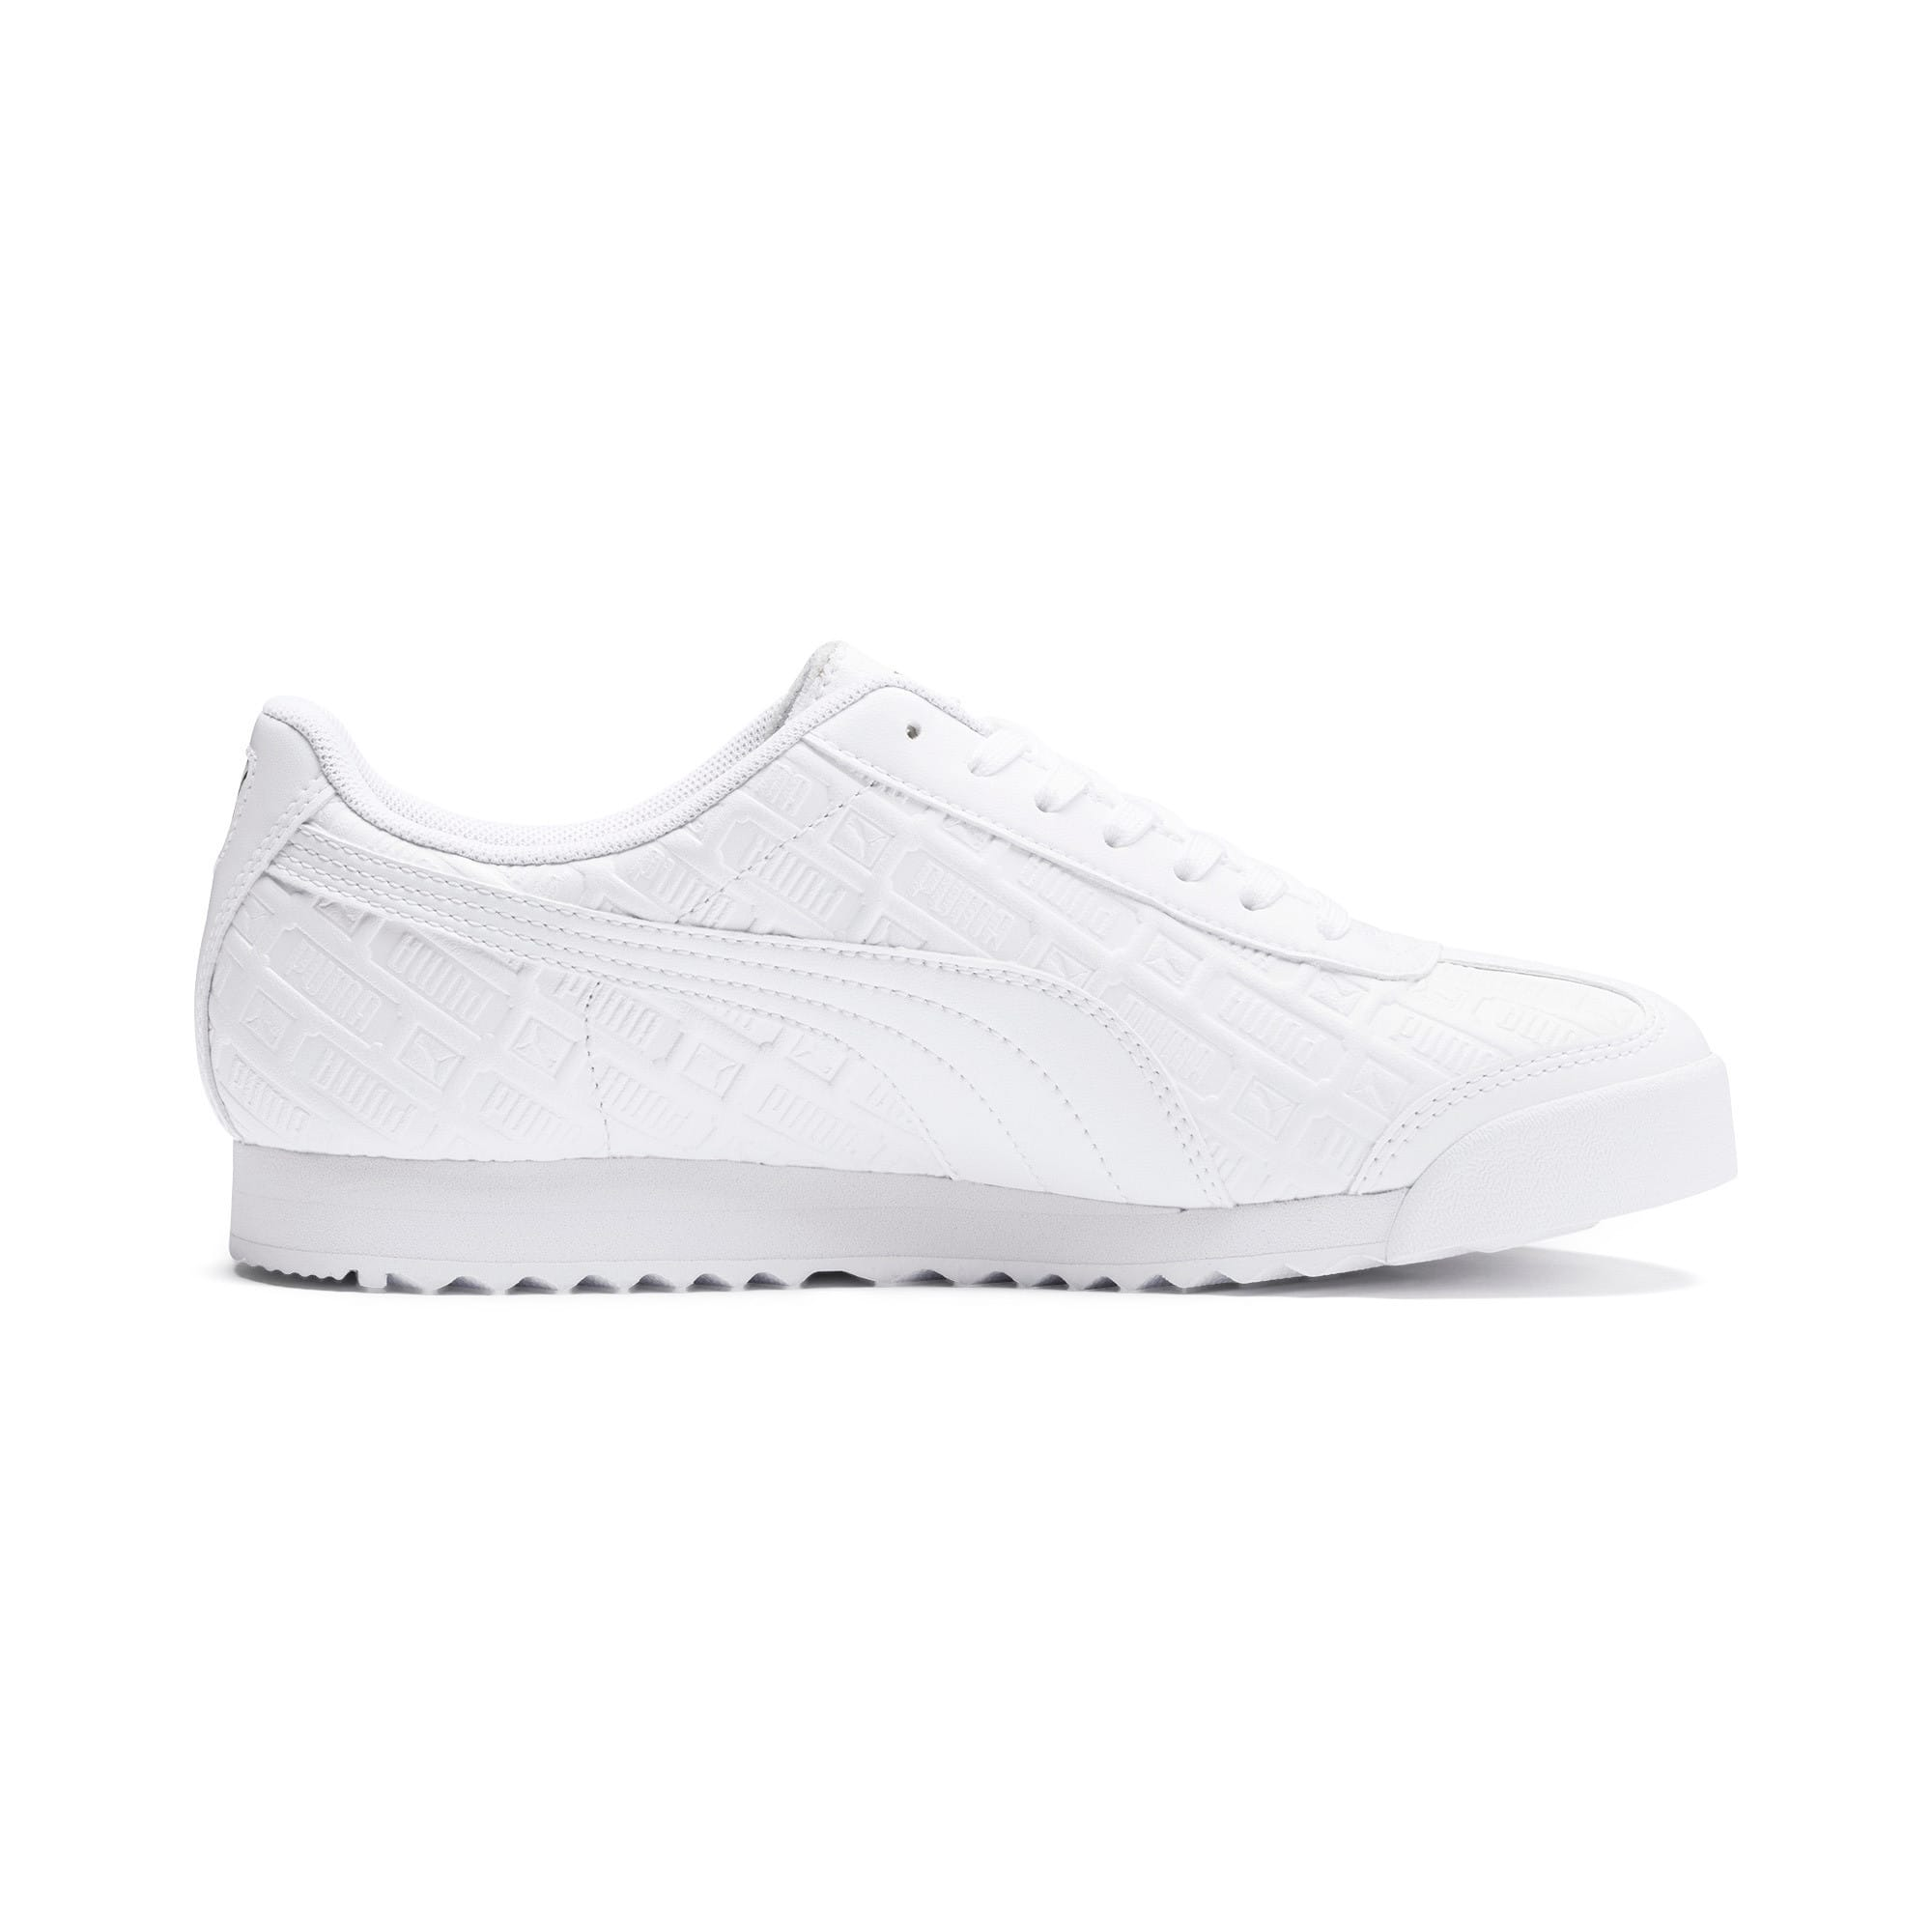 Thumbnail 6 of Roma Reinvent Women's Sneakers, Puma White-Puma Team Gold, medium